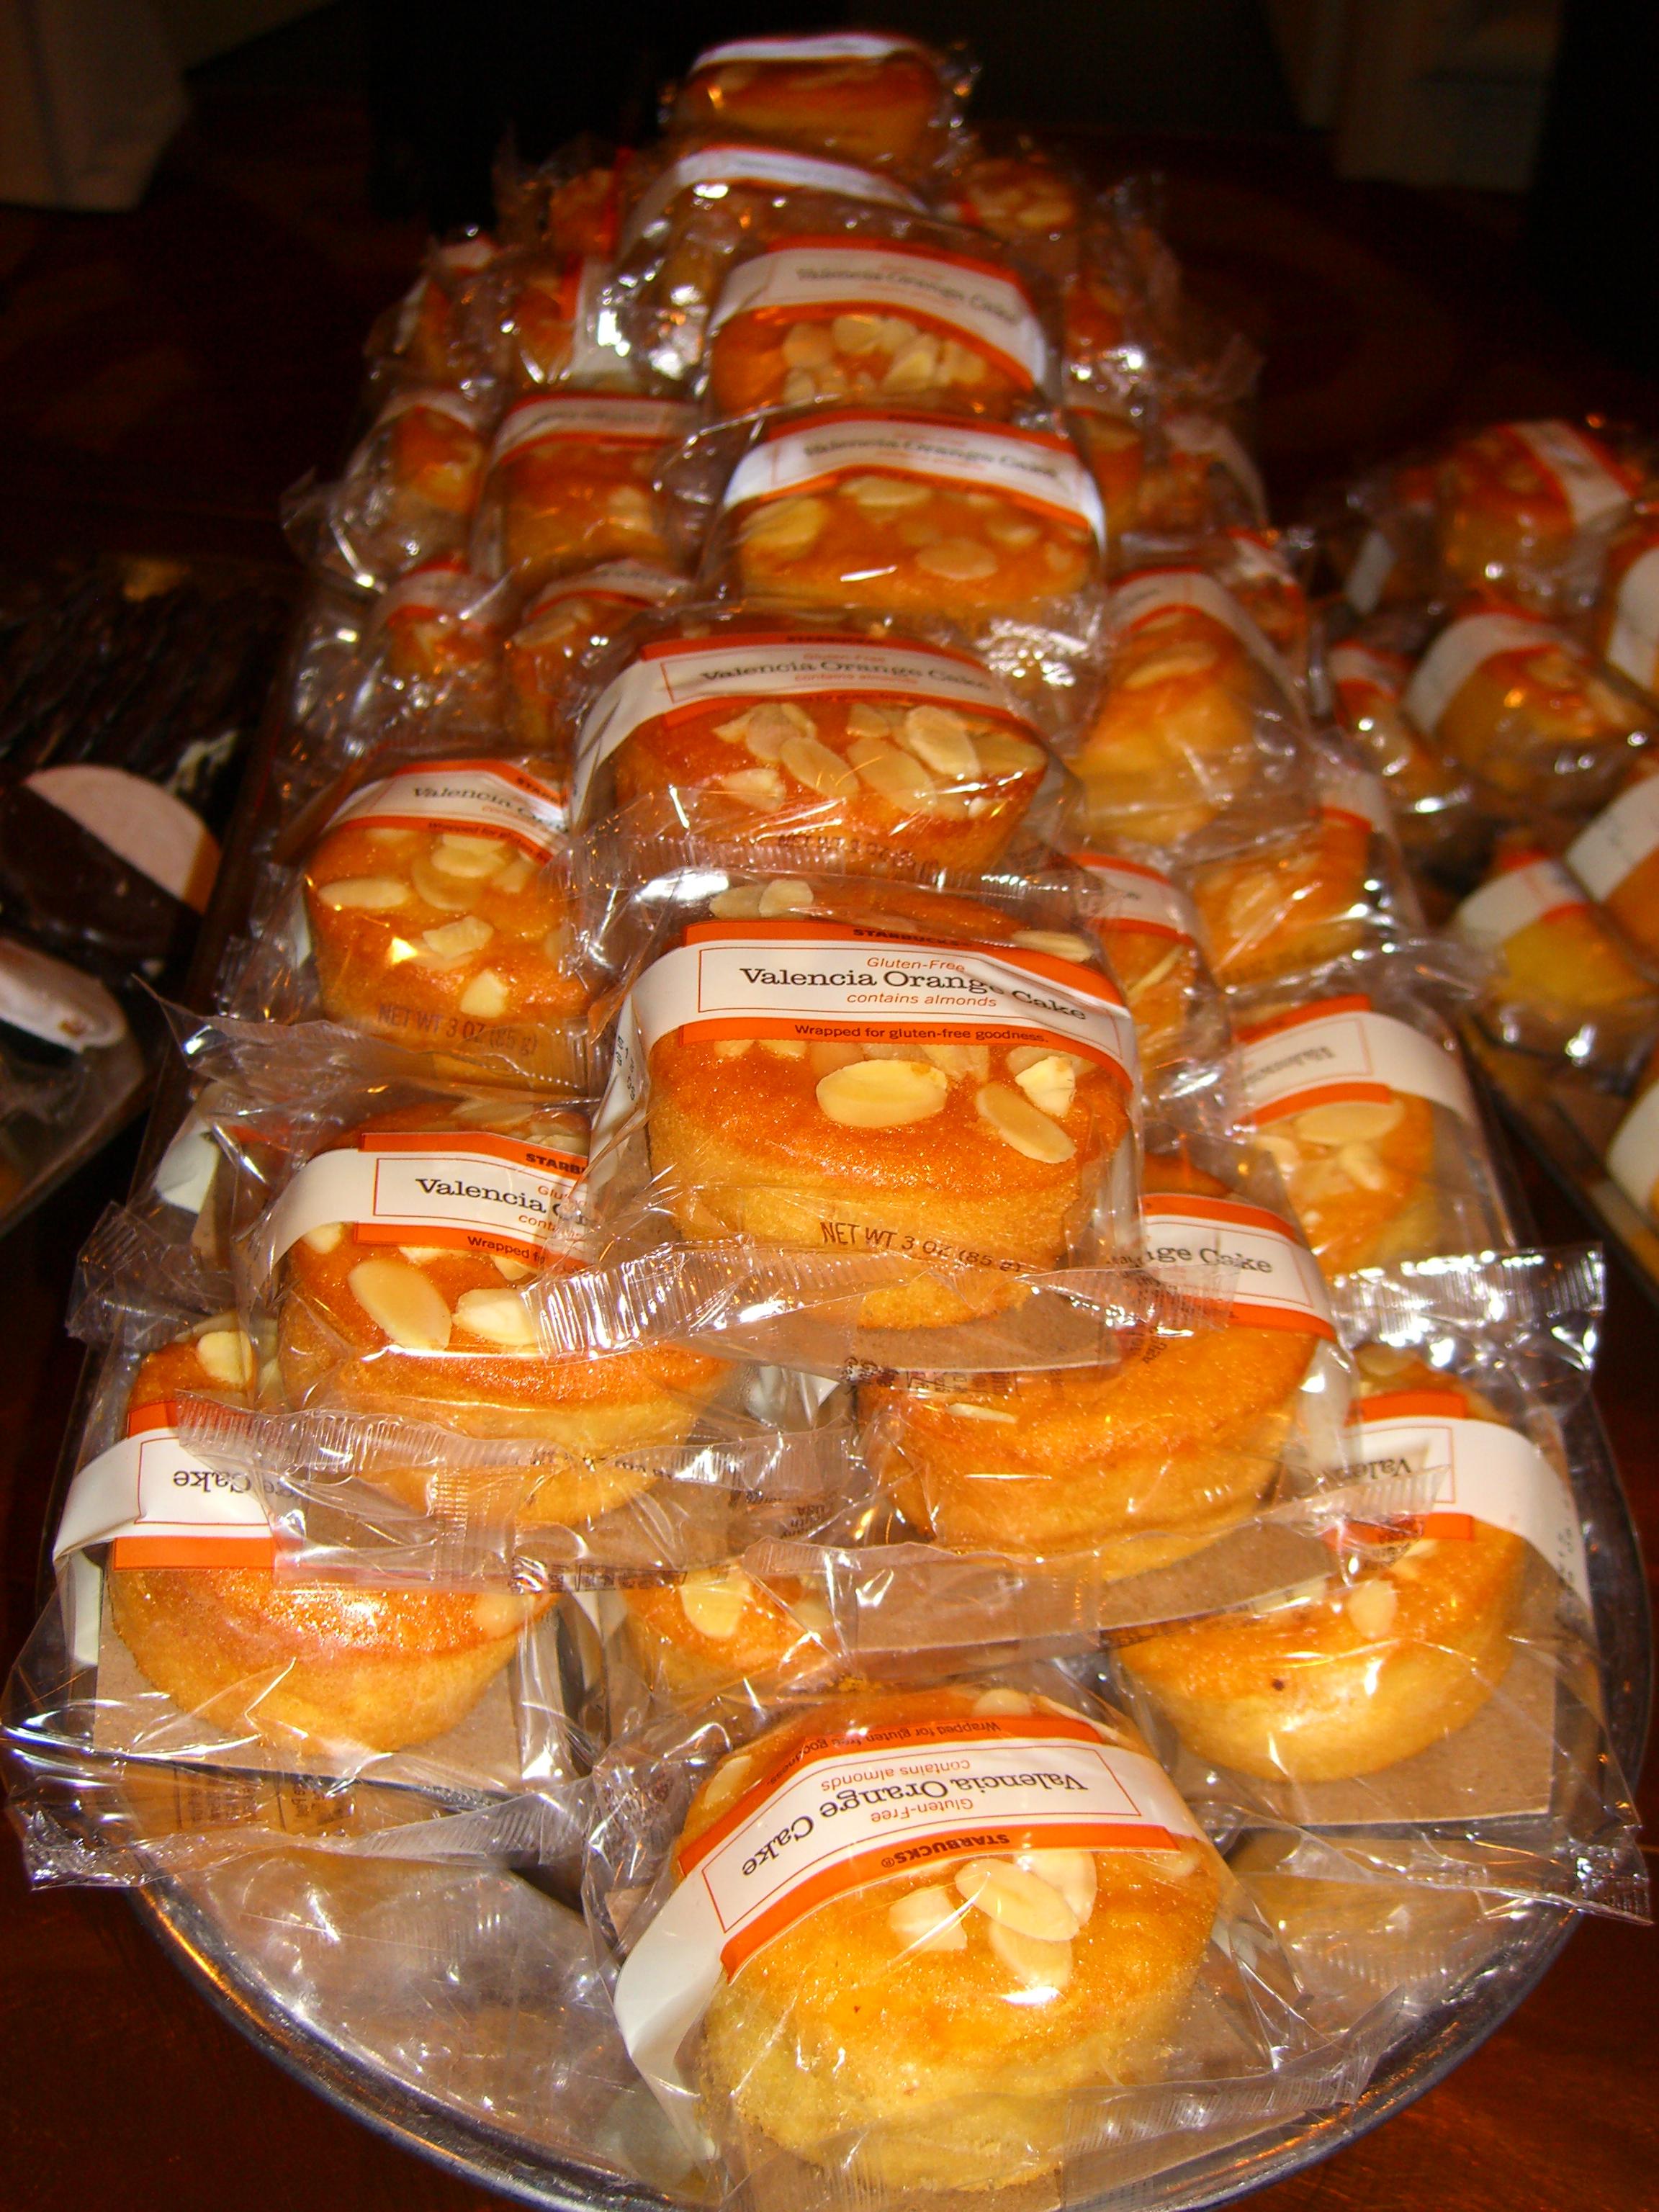 Starbucks Discontinues Gluten Free Valencia Orange Cake |